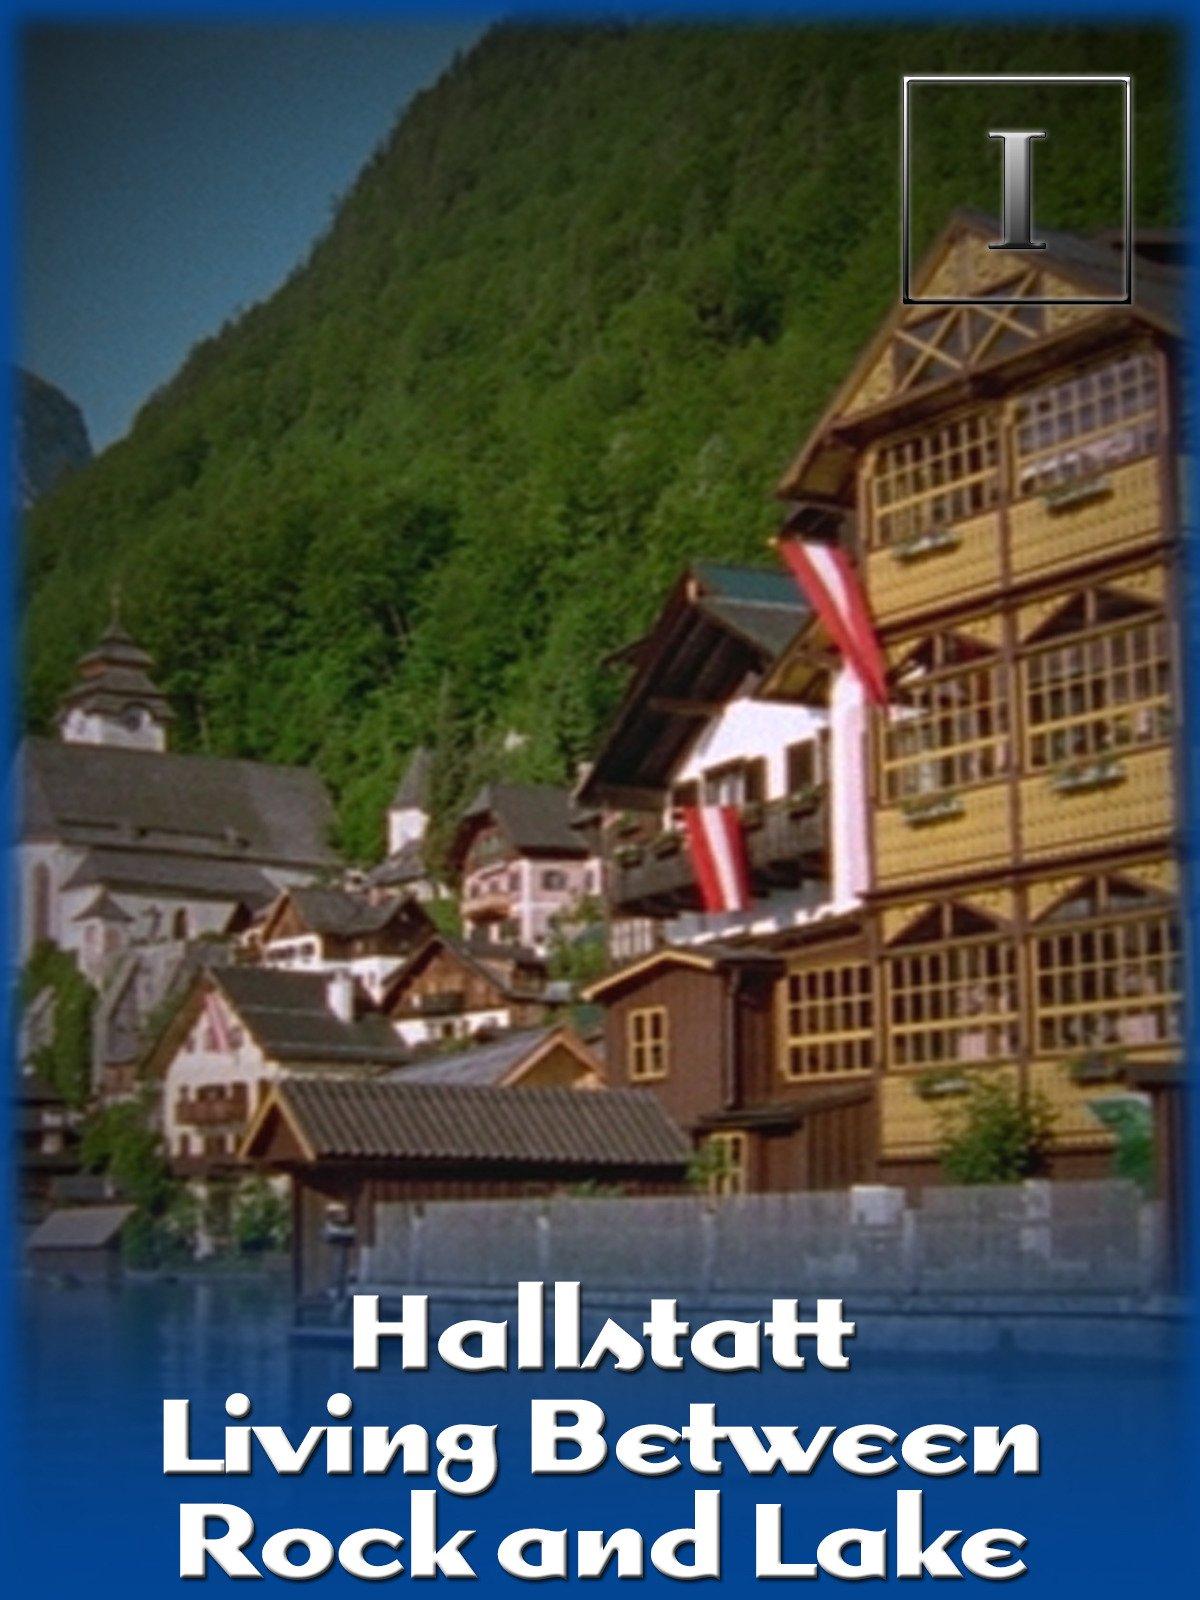 Hallstatt - Living Between Rock and Lake